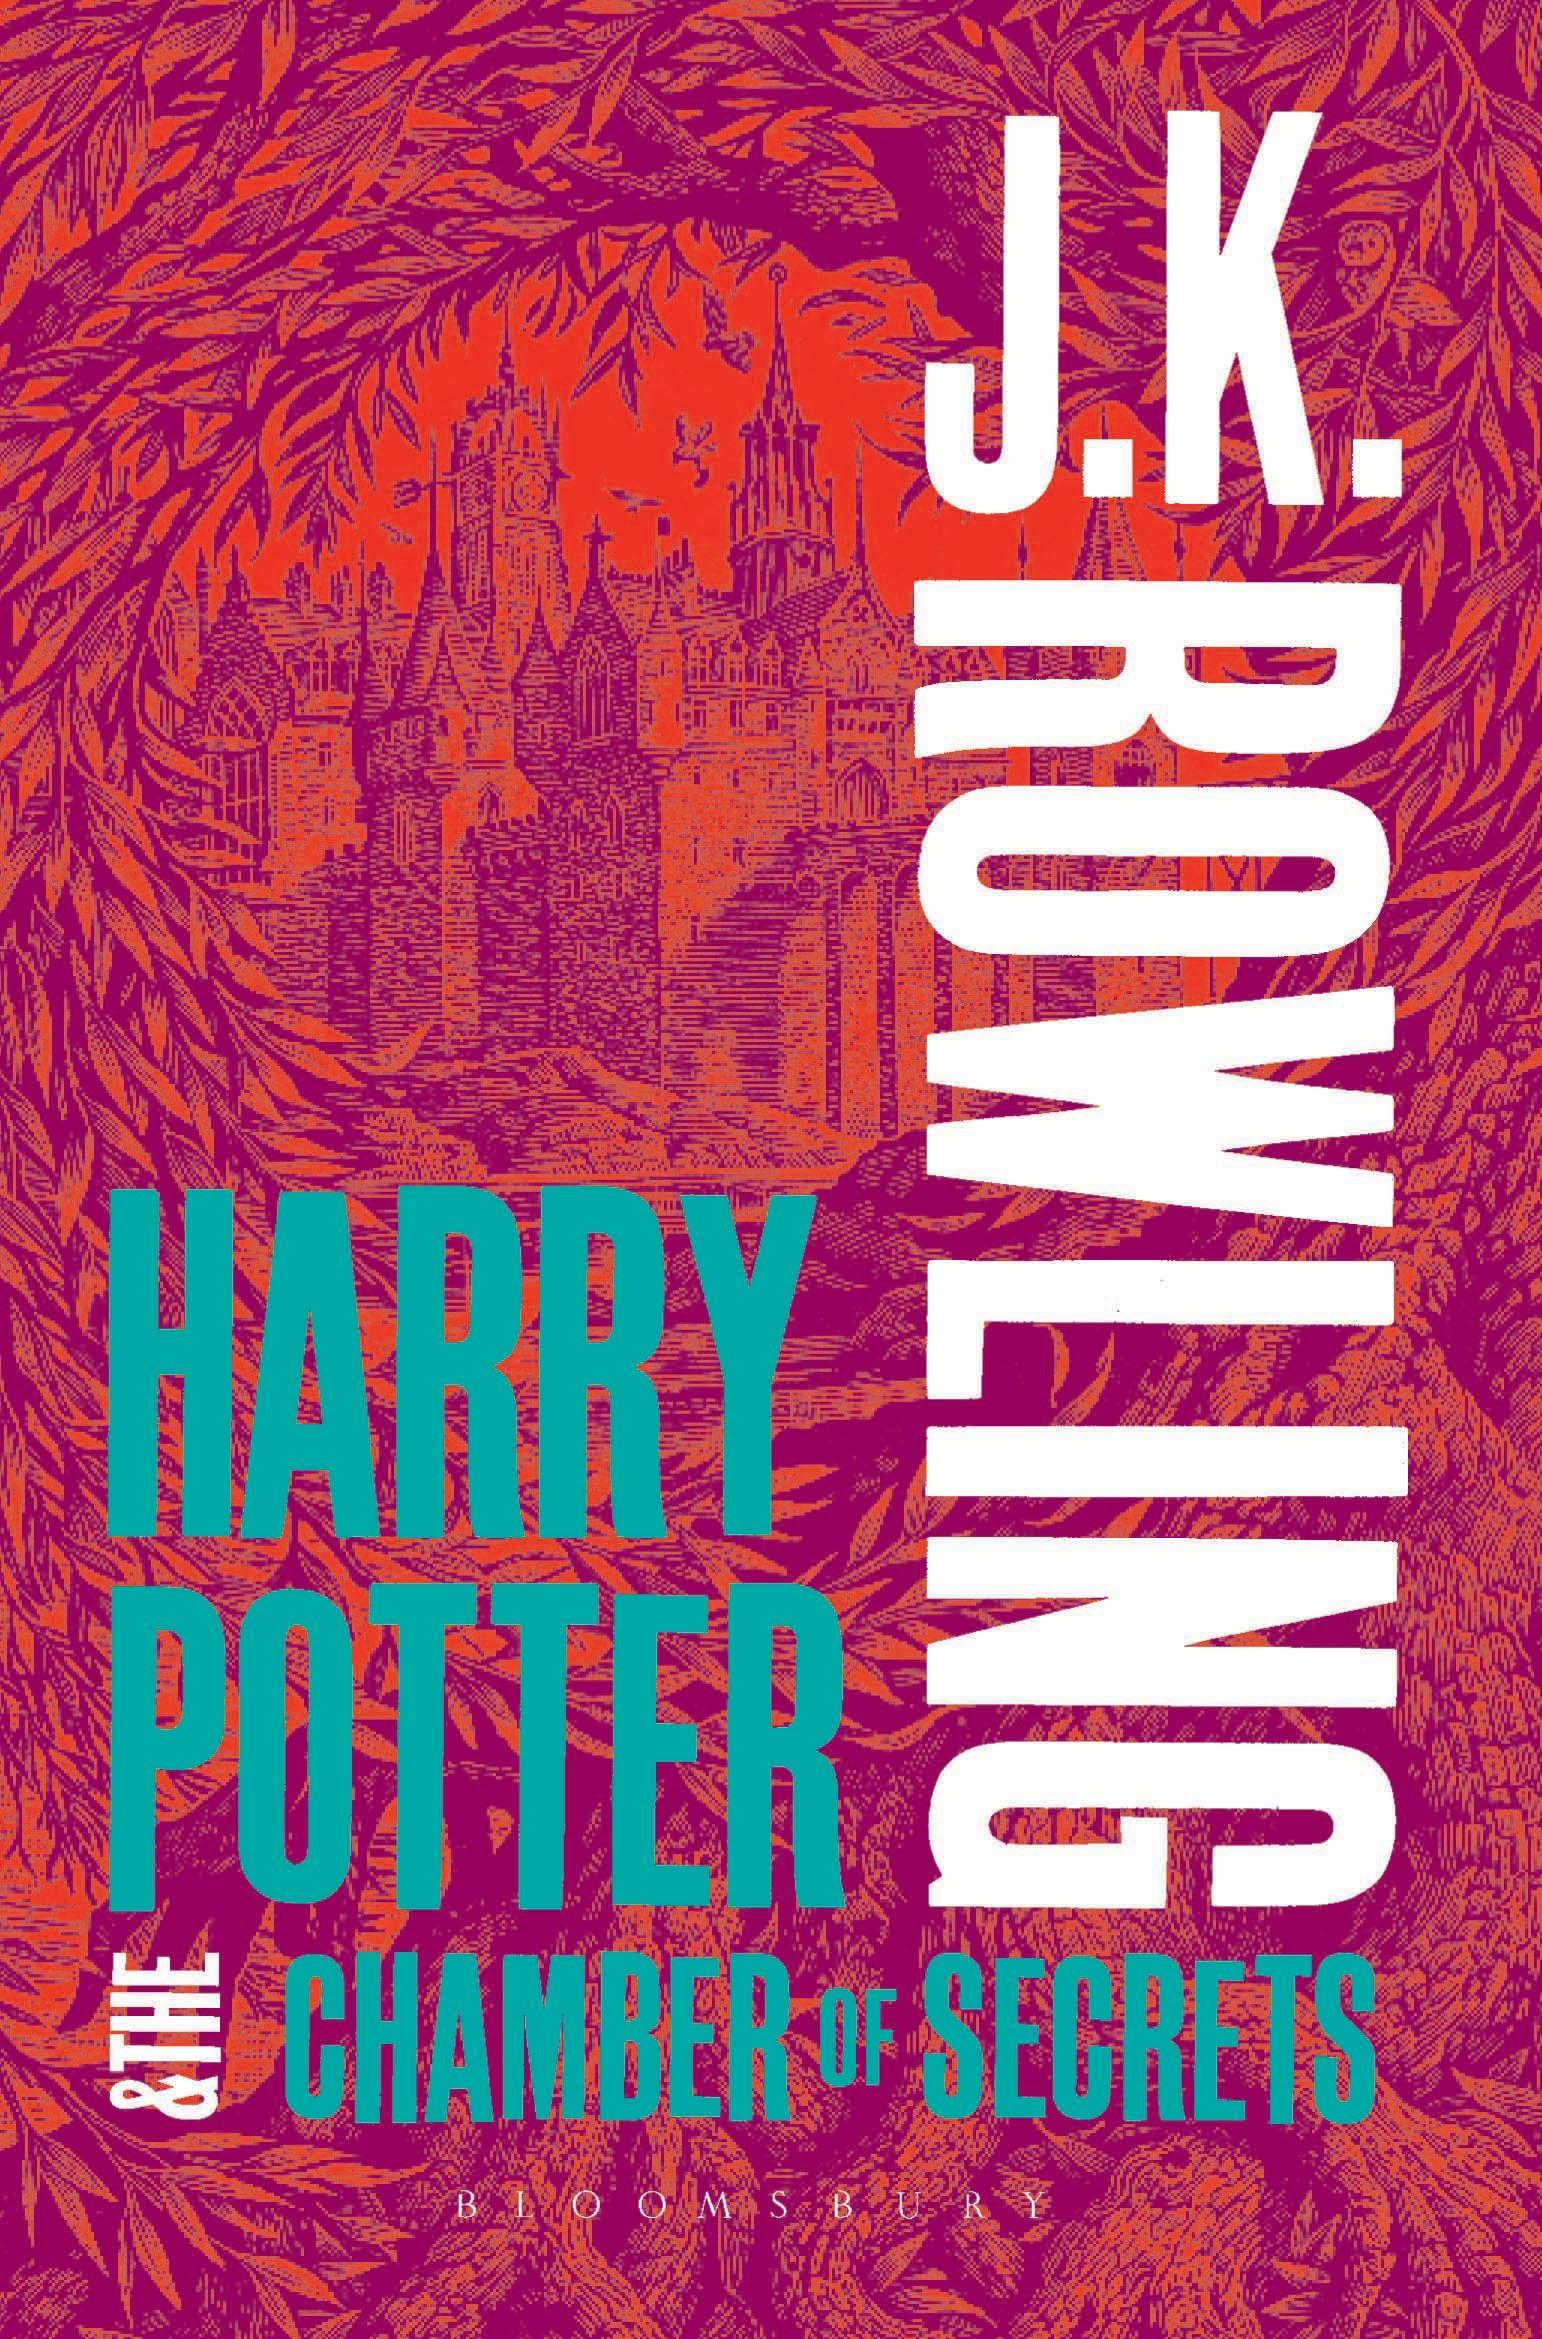 Beautiful Wallpaper Harry Potter Pink - latest?cb\u003d20150130055018  Pictures_615691.jpeg/revision/latest?cb\u003d20150130055018